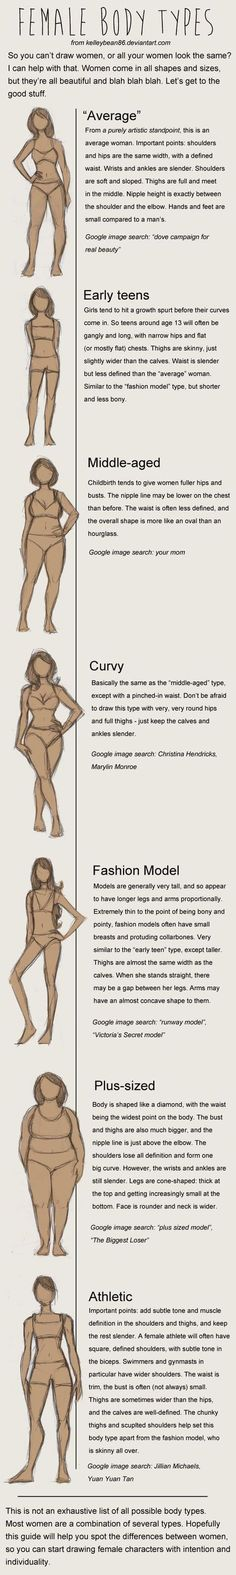 Draw Female Body Types by ~kelleybean86 on deviantART: